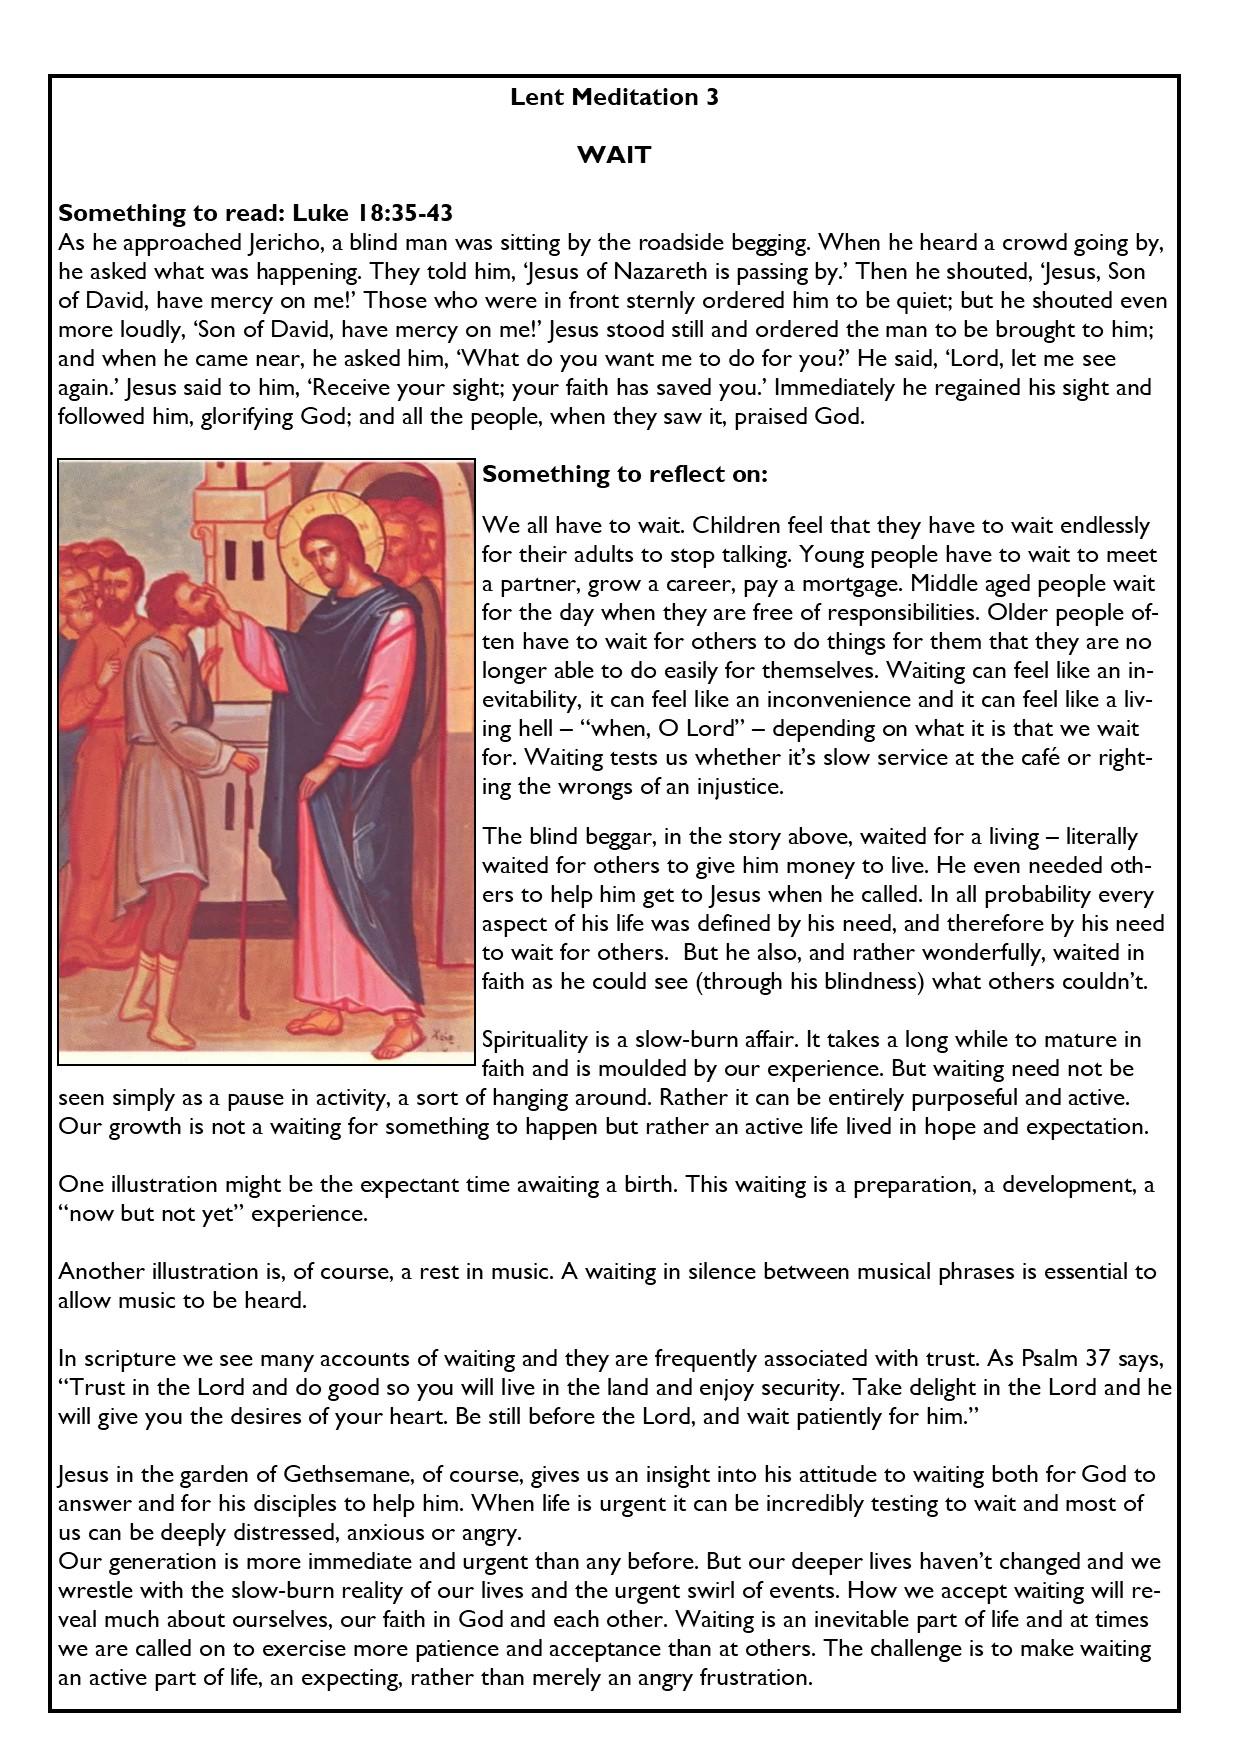 Lent 3 in graphic.jpg